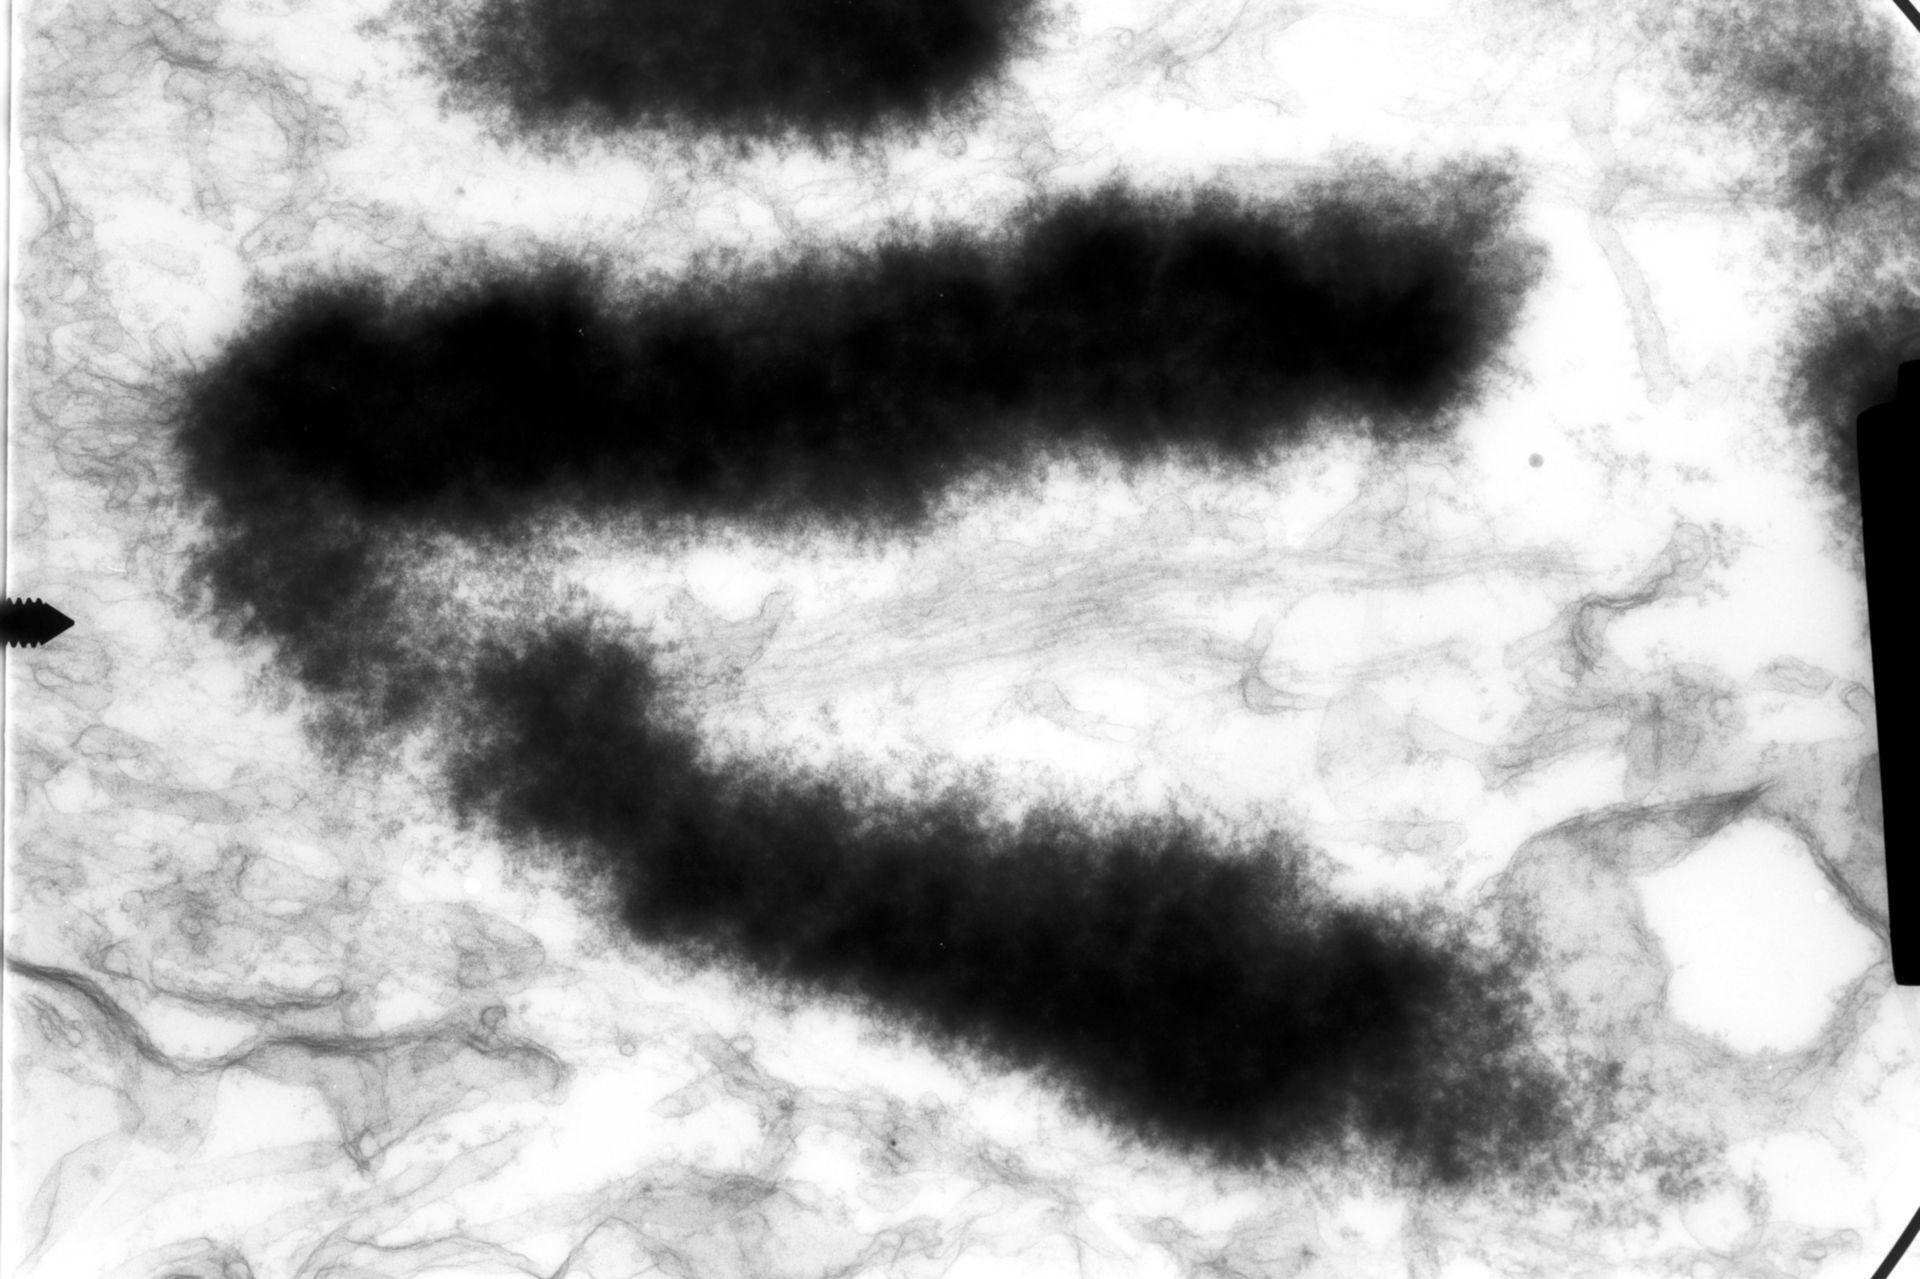 Haemanthus katharinae (Nuclear chromosome) - CIL:13187